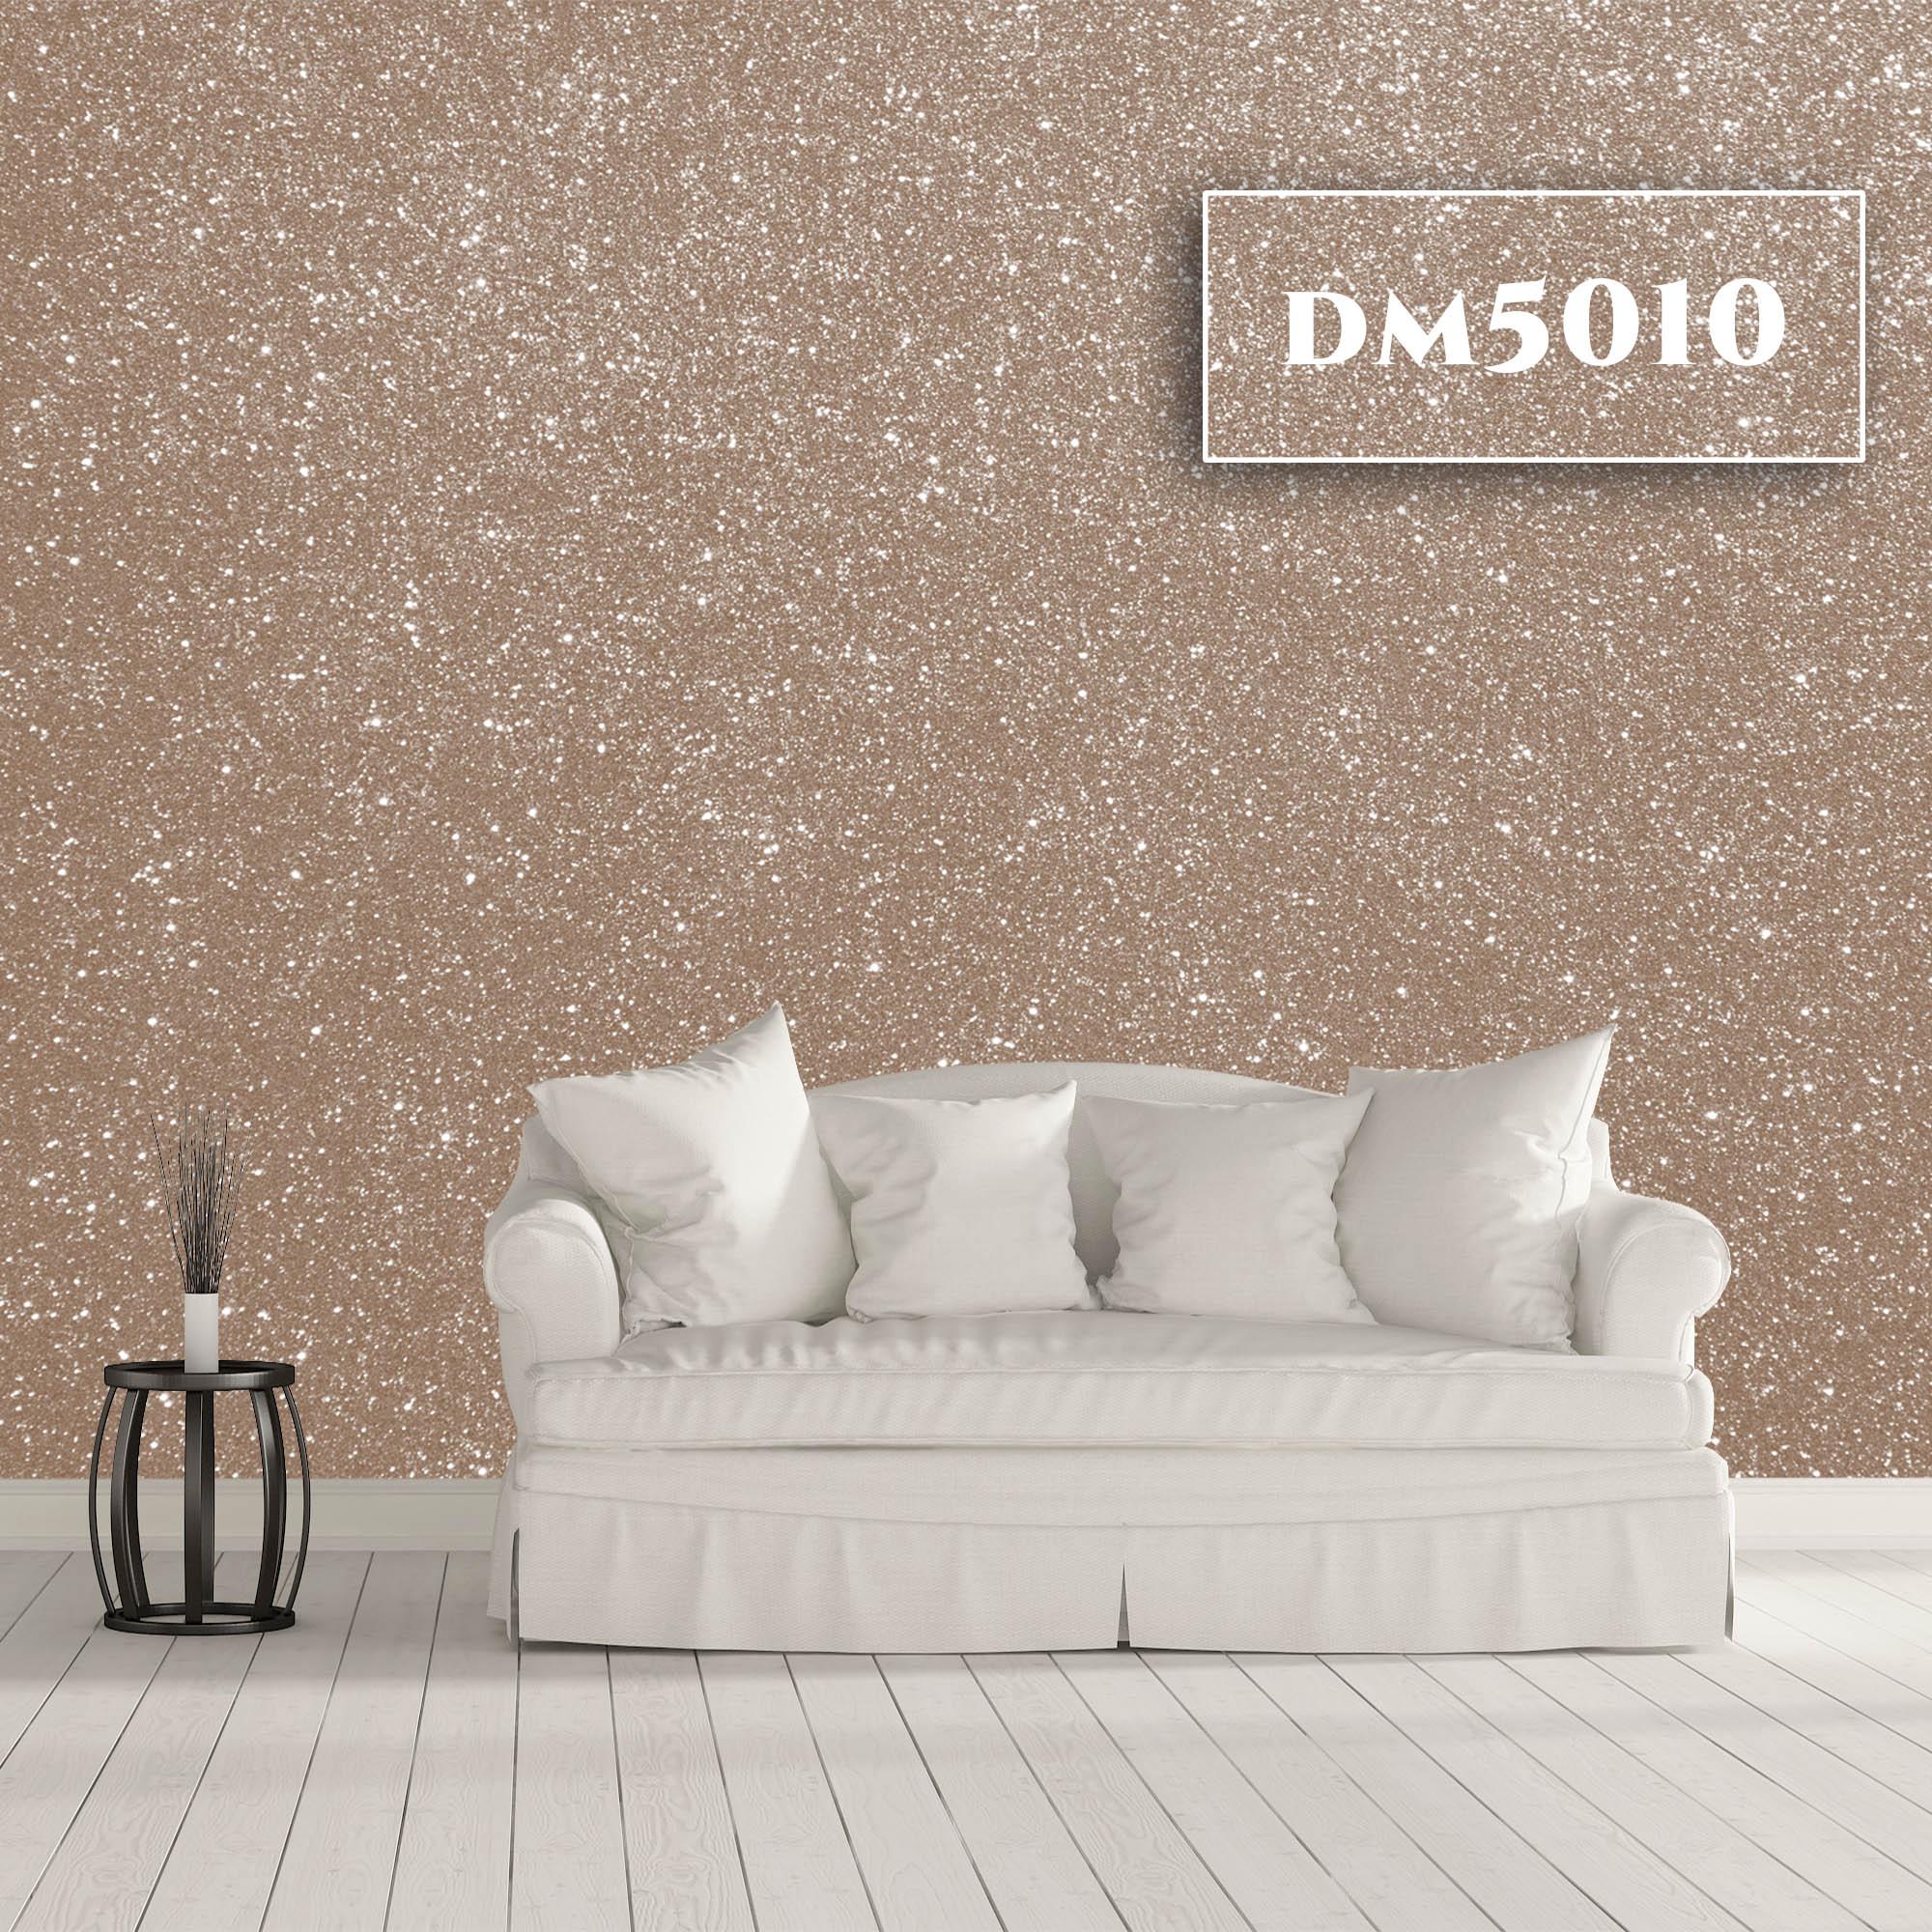 DM5010